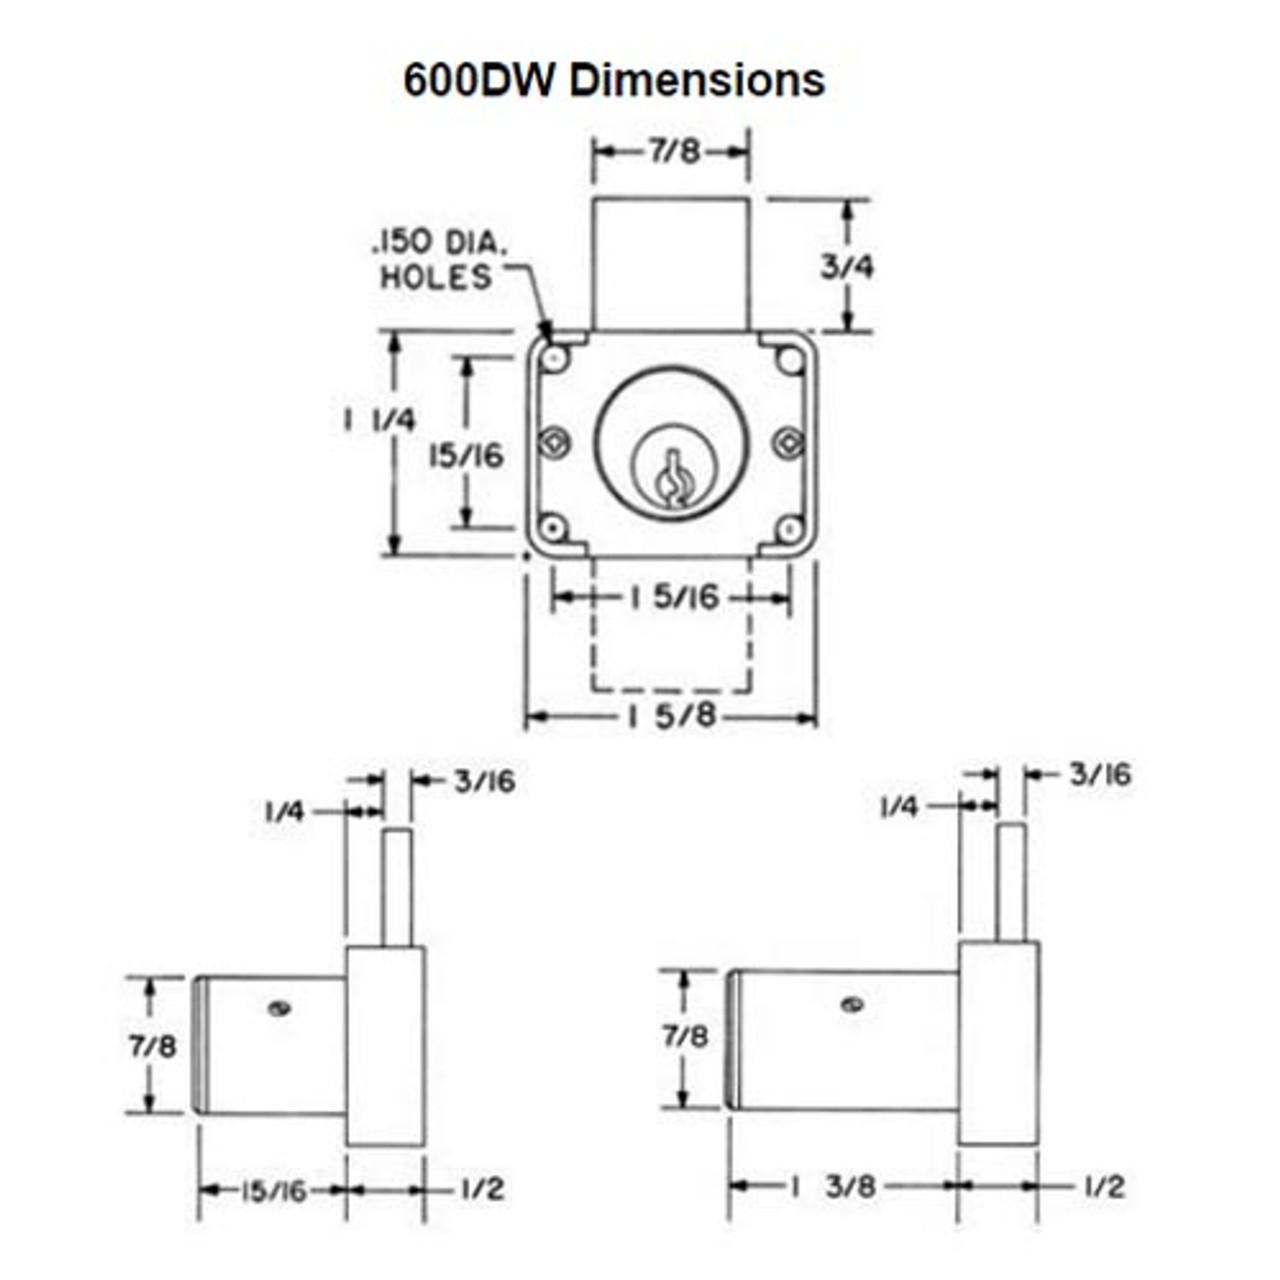 Olympus 600DW-KA4T2-26D-7/8 R Series Drawer Deadbolt Cabinet Locks in Satin Chrome